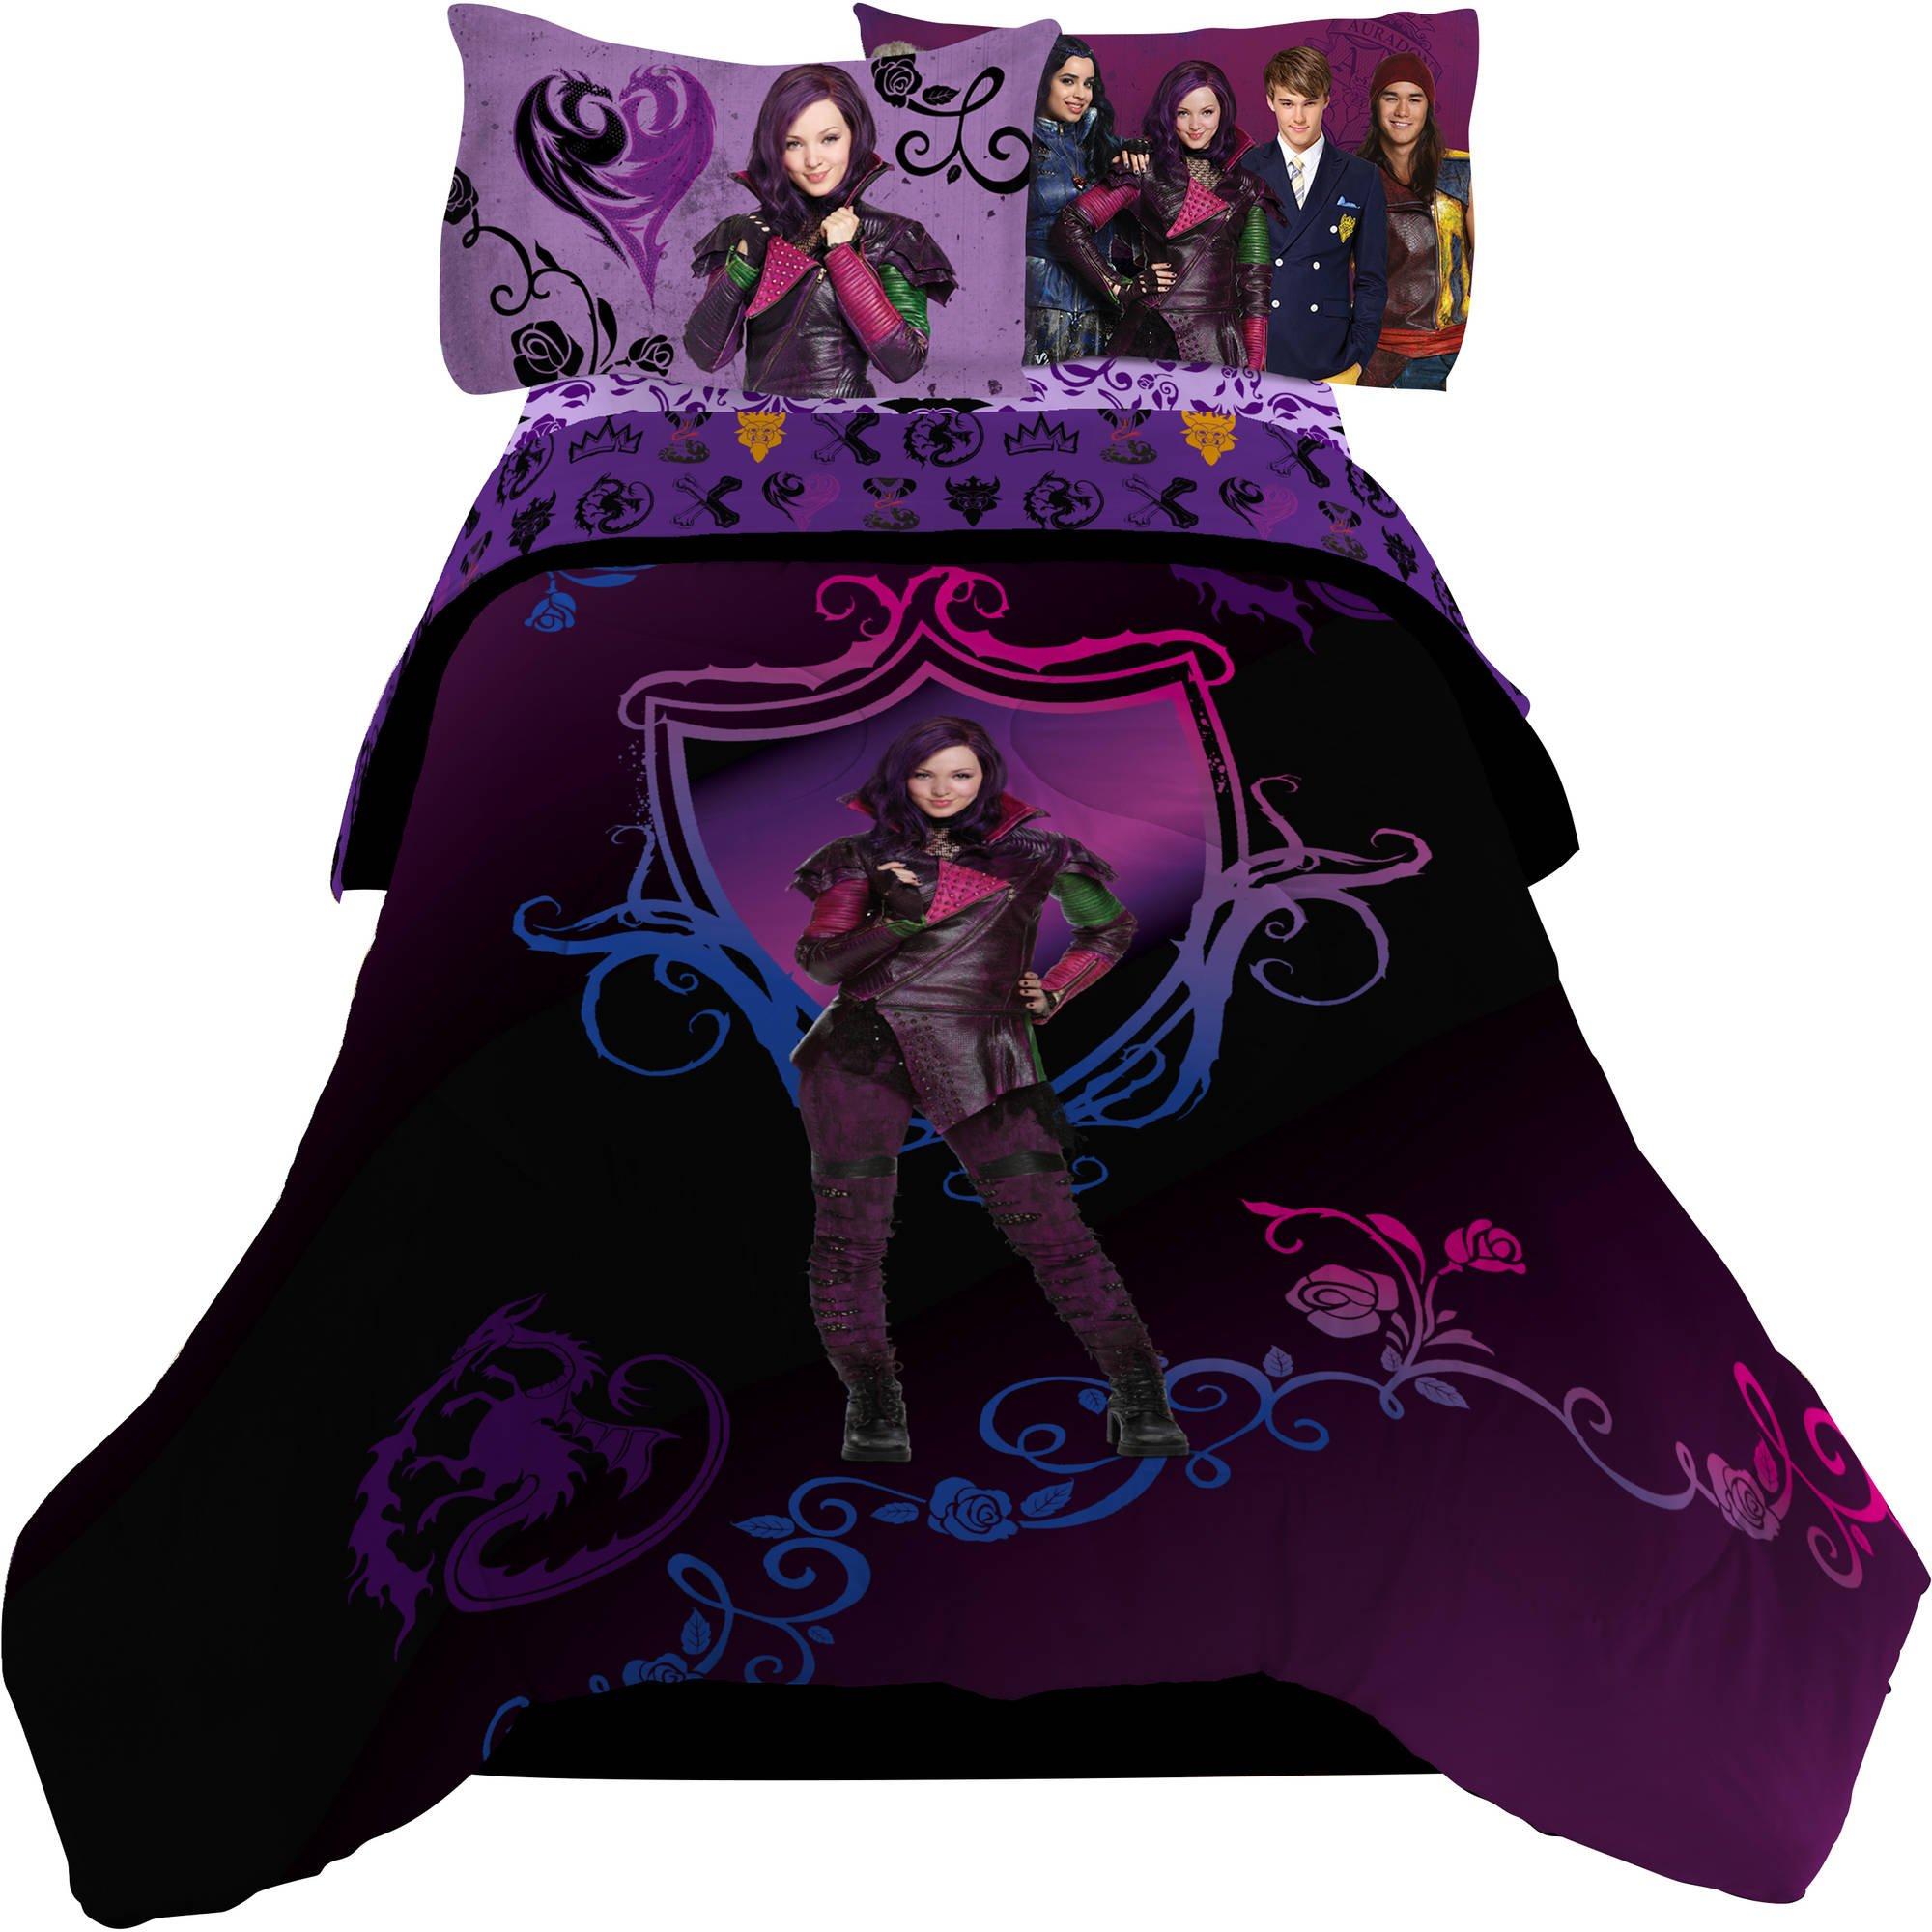 Disney Descendants ''Best of Both Worlds'' Twin/Full Bedding Comforter and Twin Sheet Set